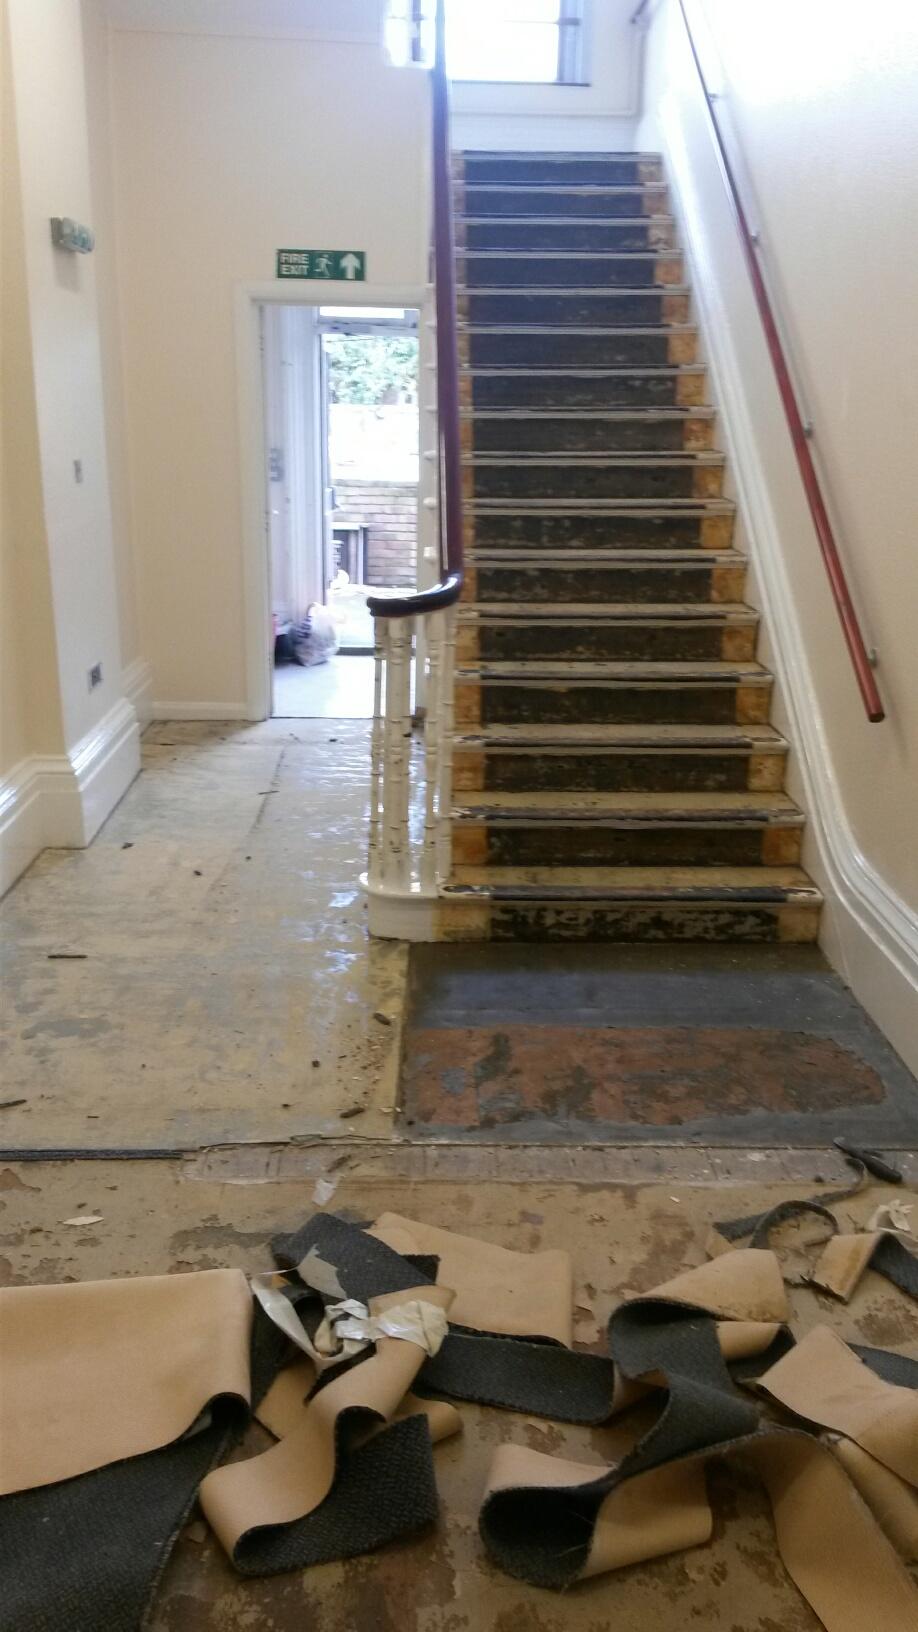 Gradus Stair Nosings And Scala Classic Carpet